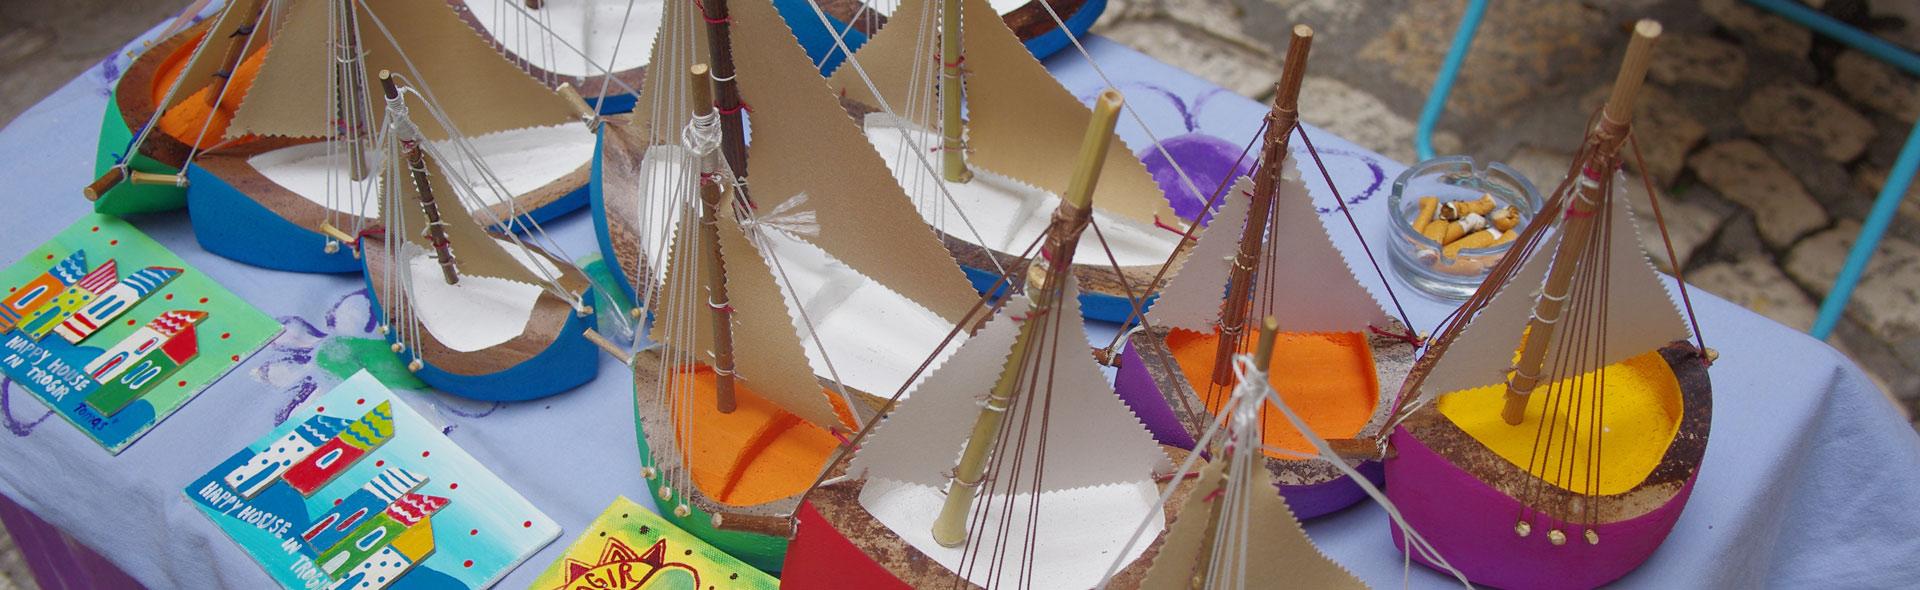 Goga's Palmenschiffchen in Trogir